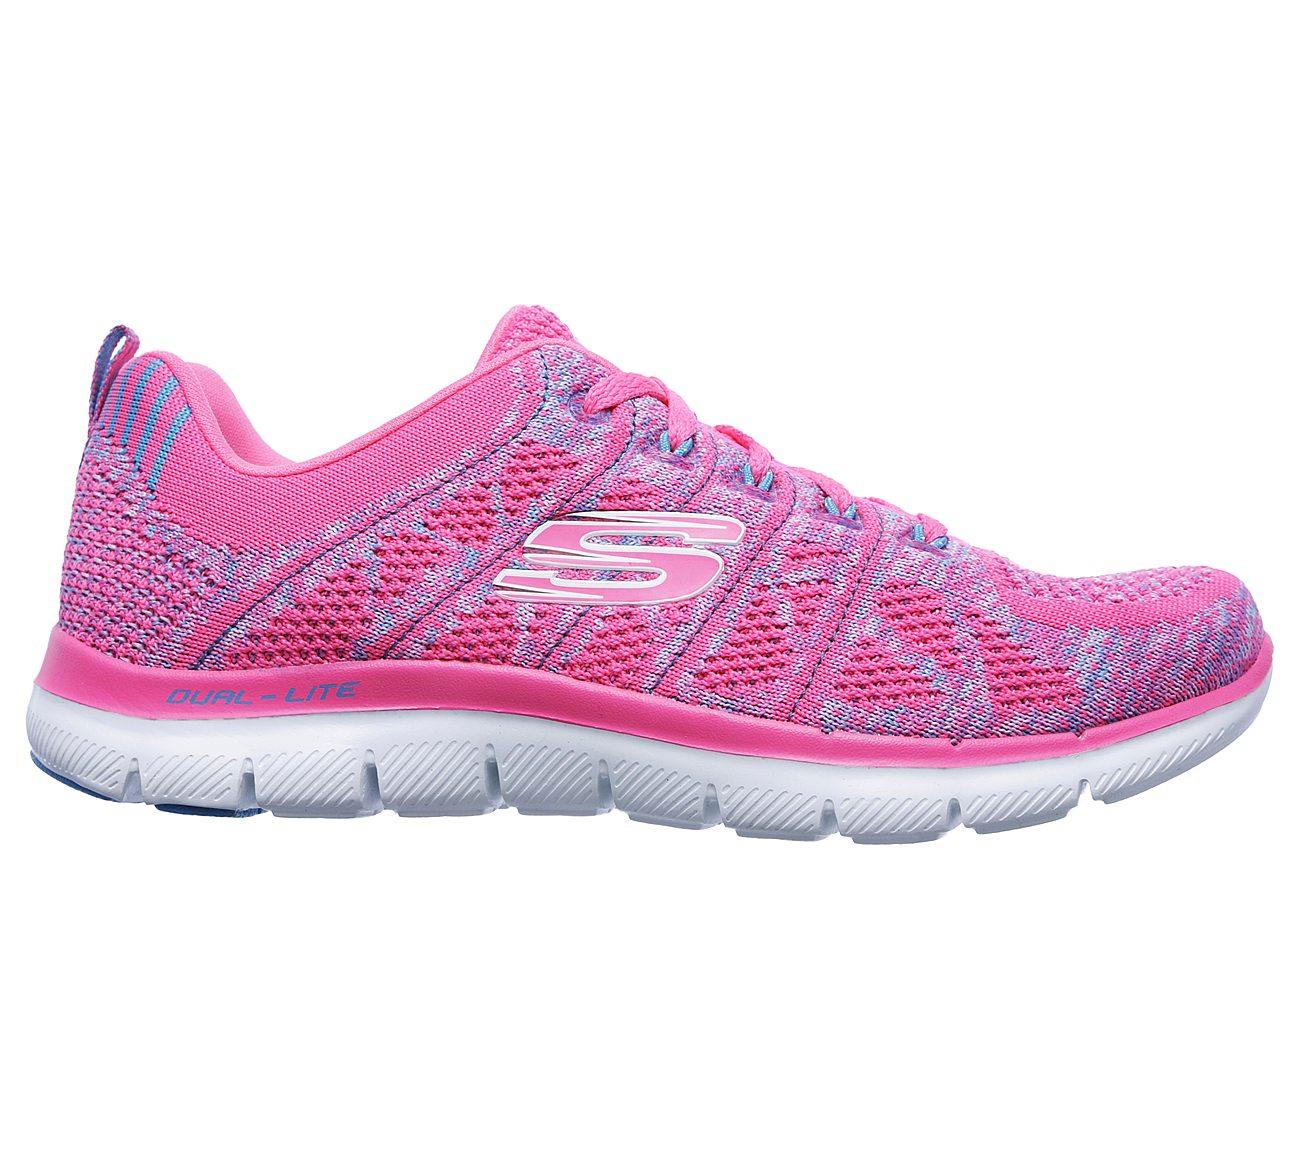 12623 Hot Pink Skechers shoes Memory Foam Women Sporty Train Comfort Casual Soft